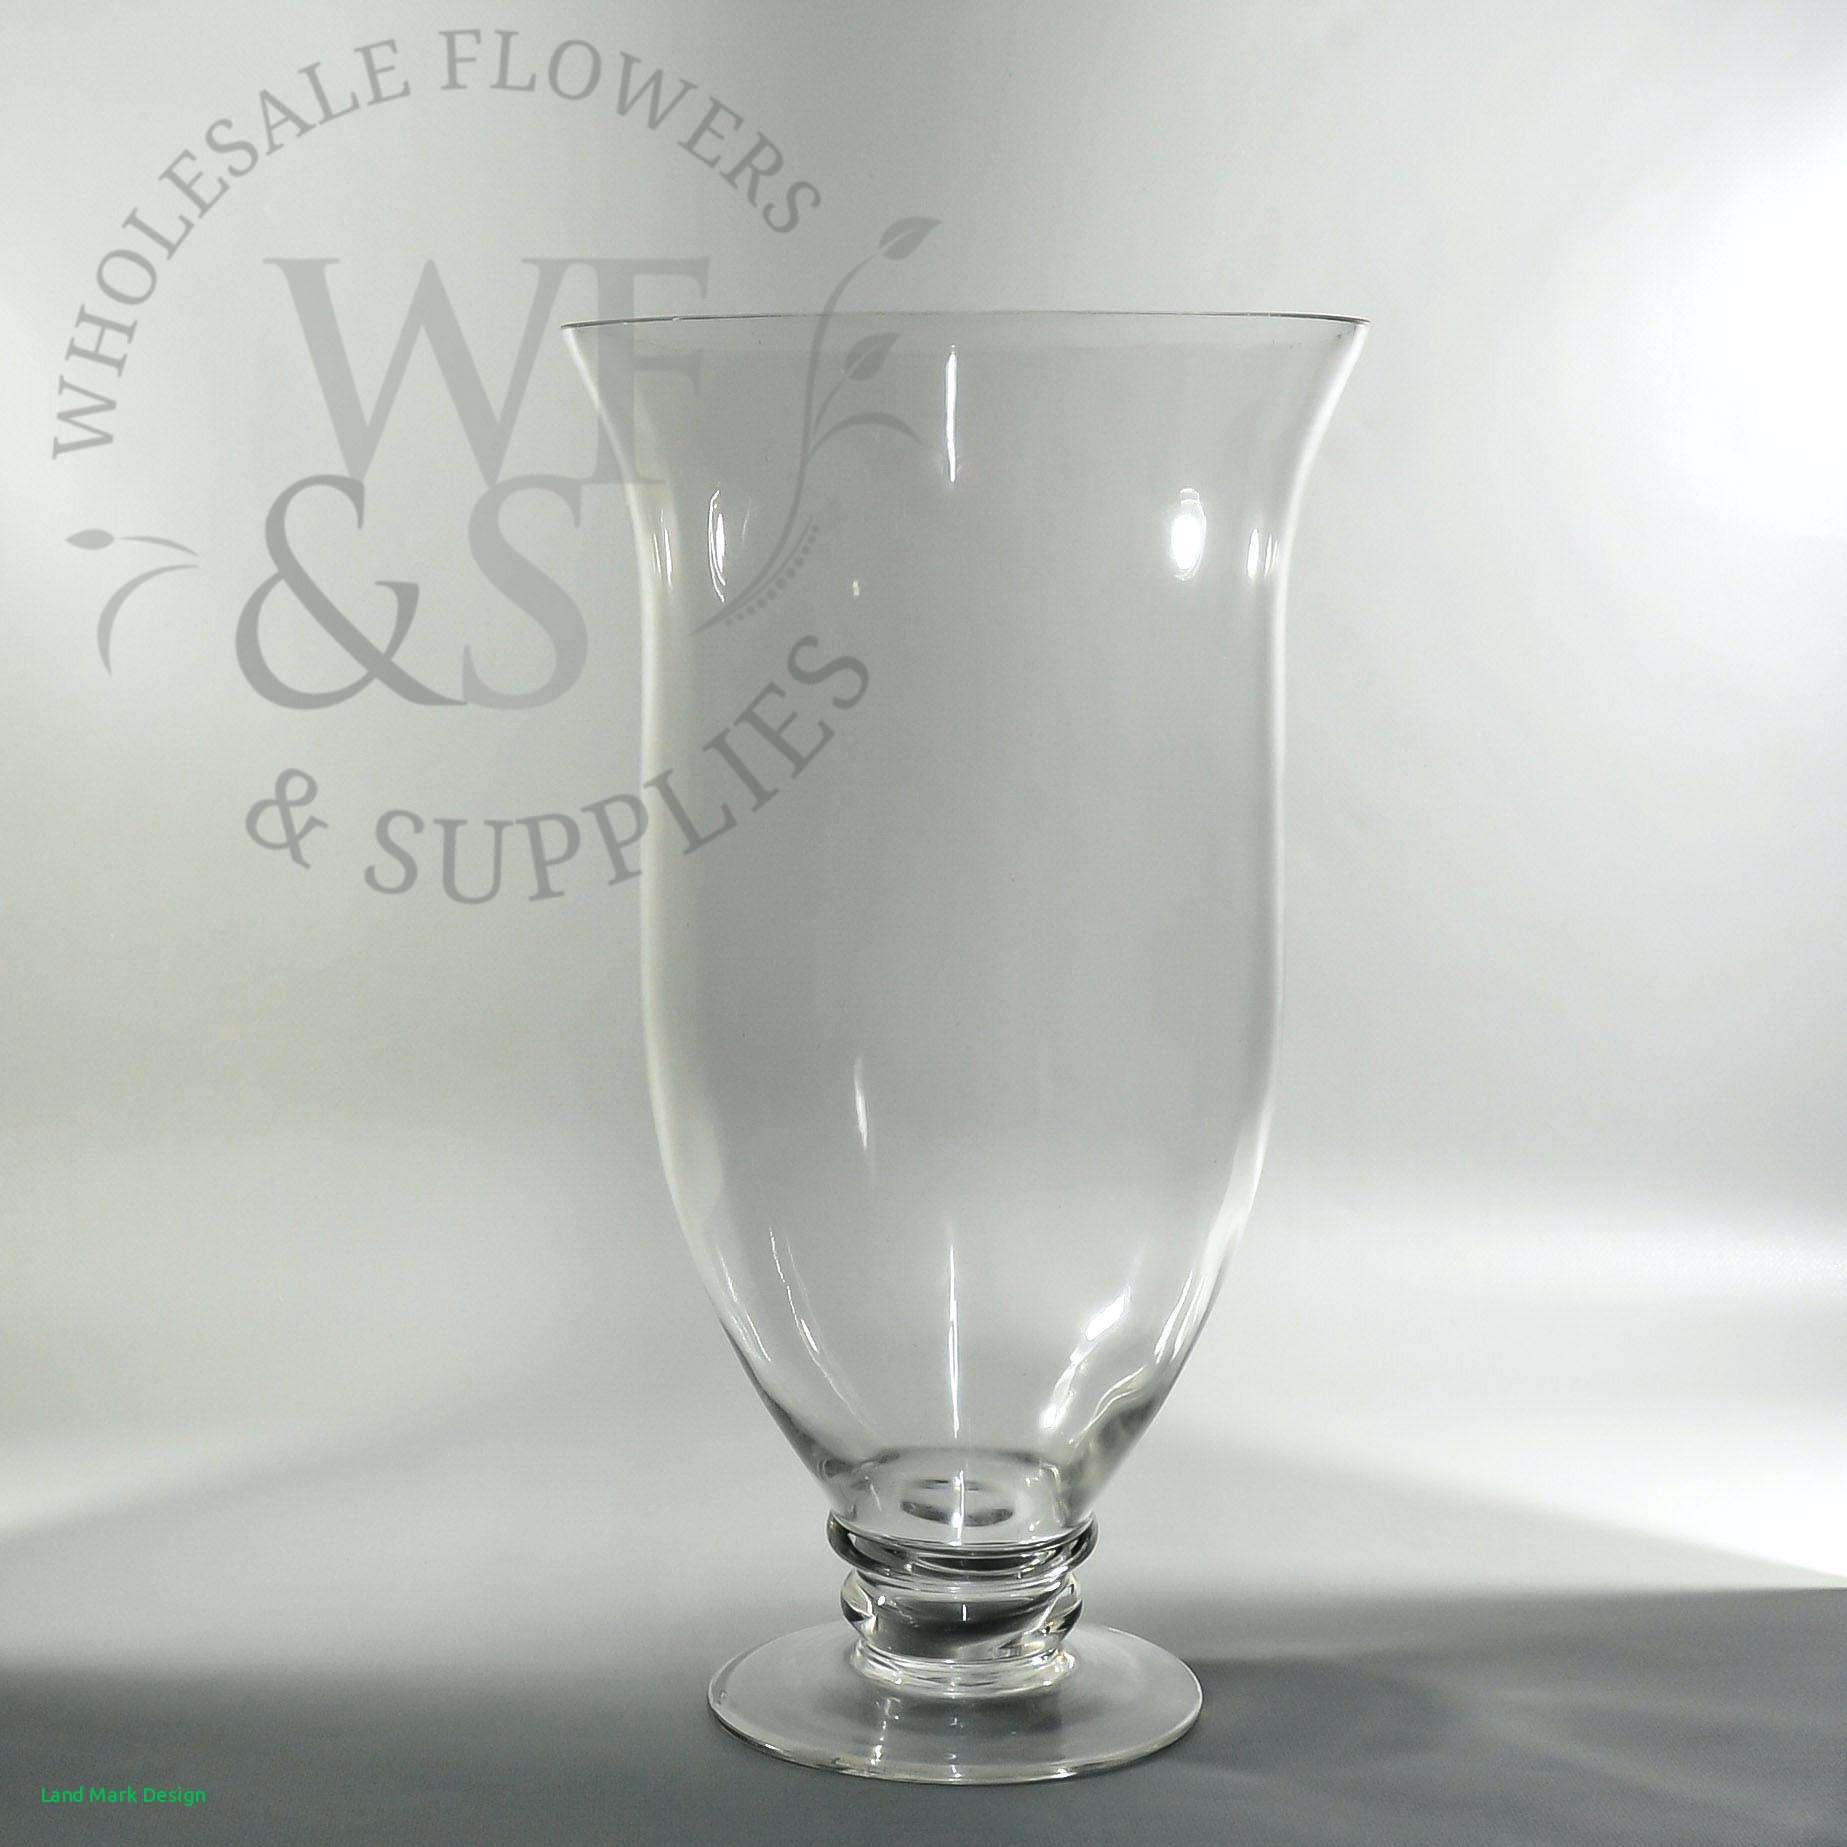 lenox crystal vase value of white glass bowl image black and white living room cool living room regarding white glass bowl images glass vase ideas design of white glass bowl image black and white